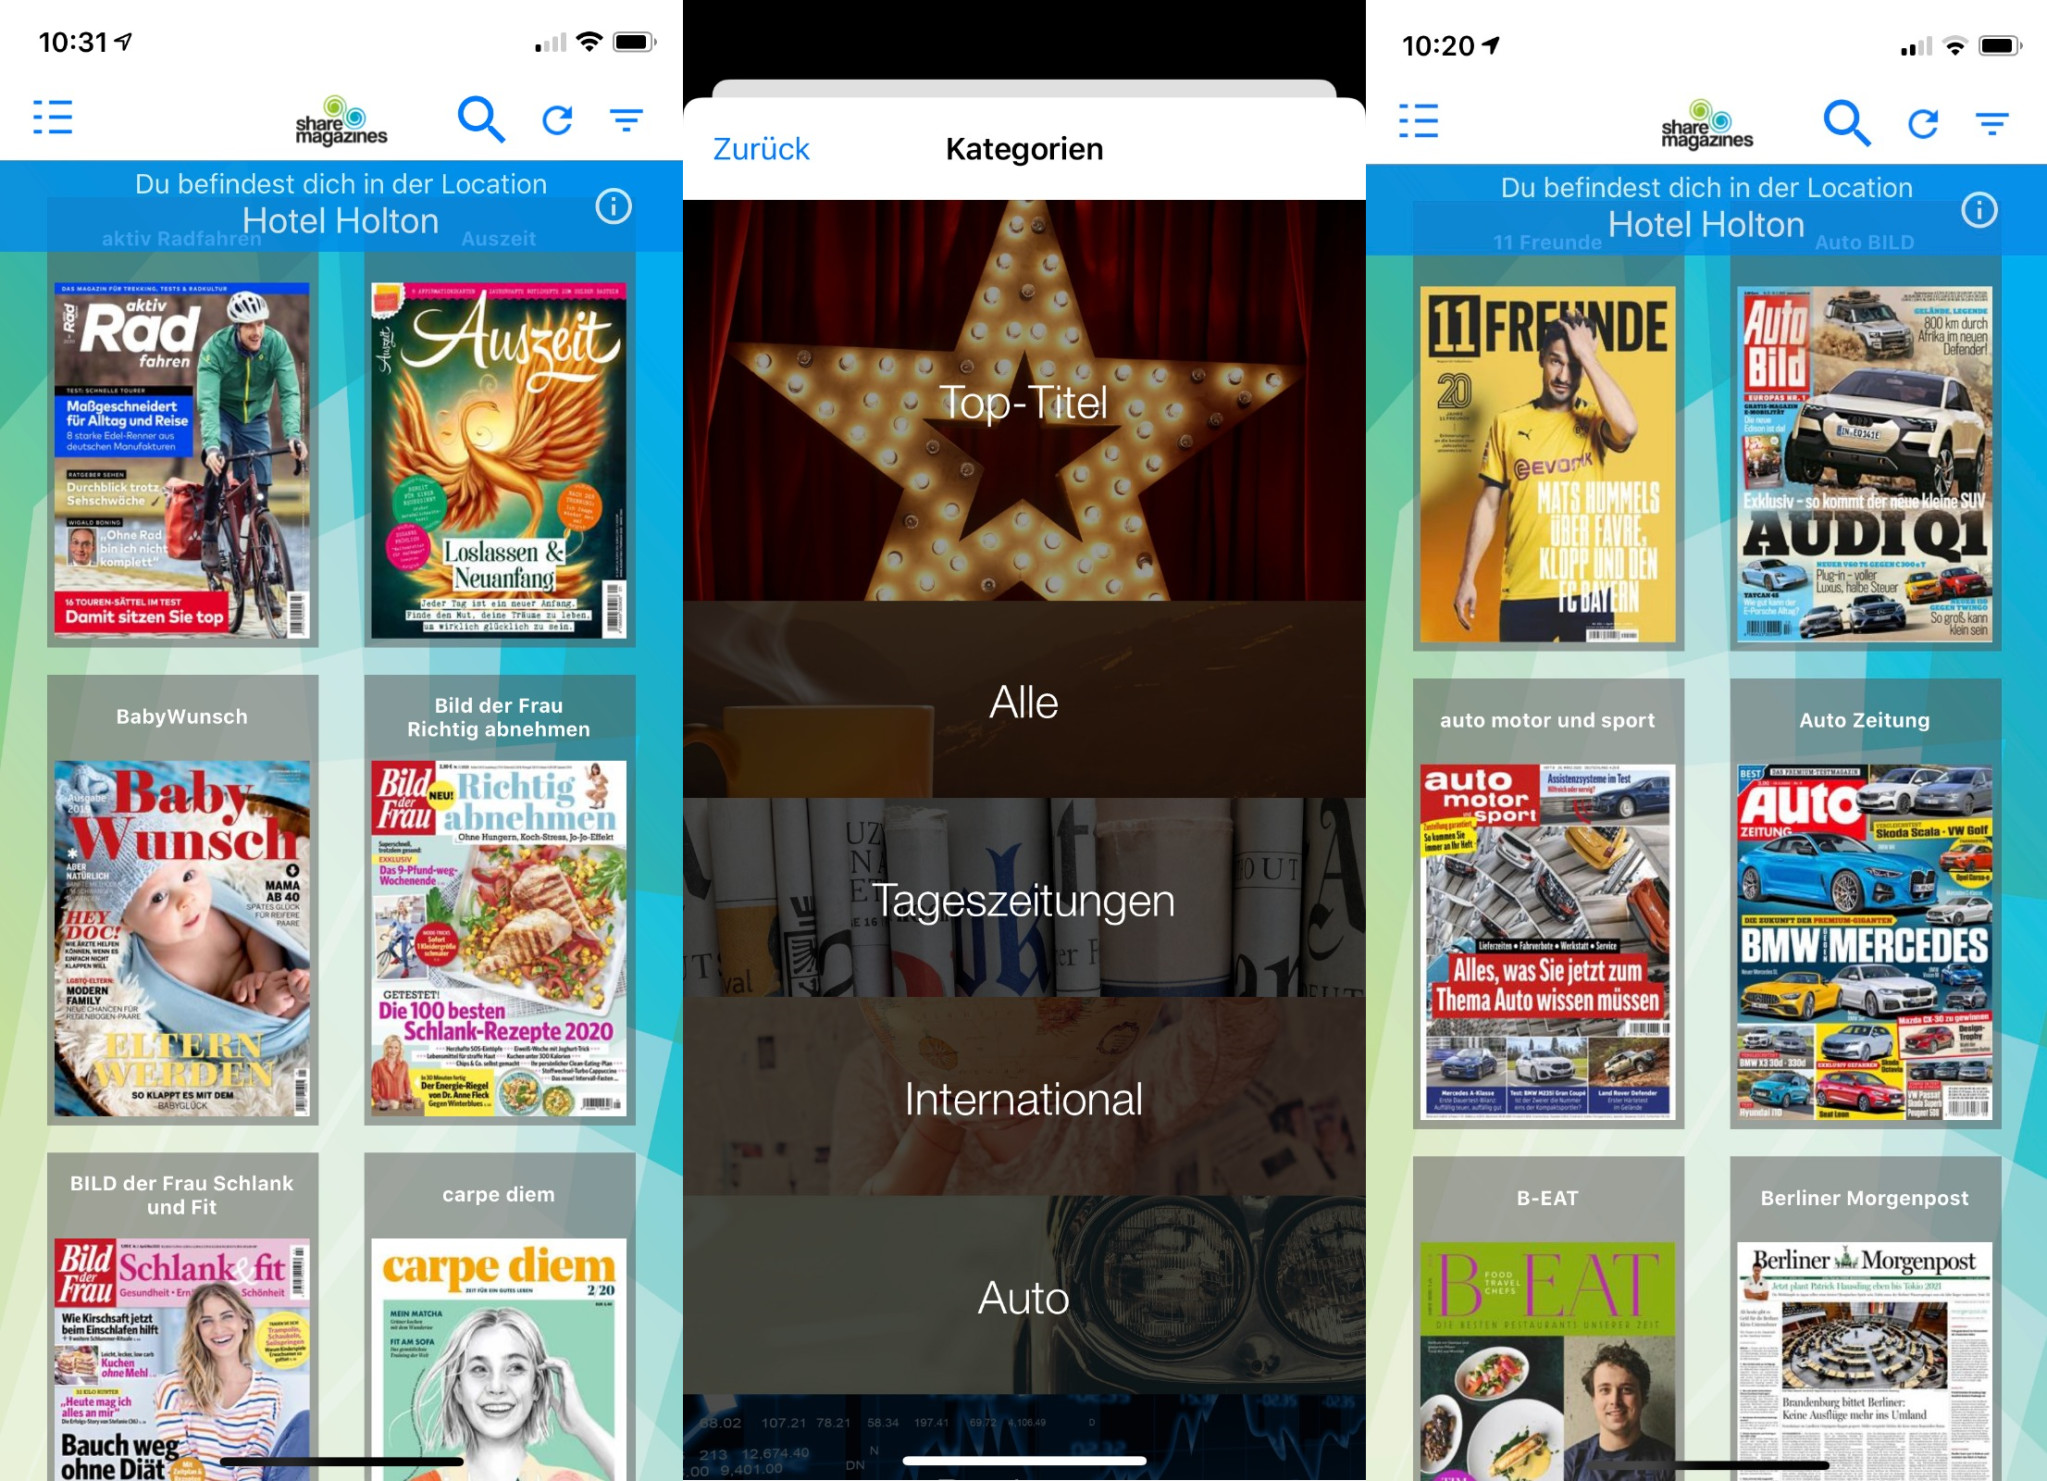 Screenshot 1 - Sharemagazines (App für iPhone & iPad)